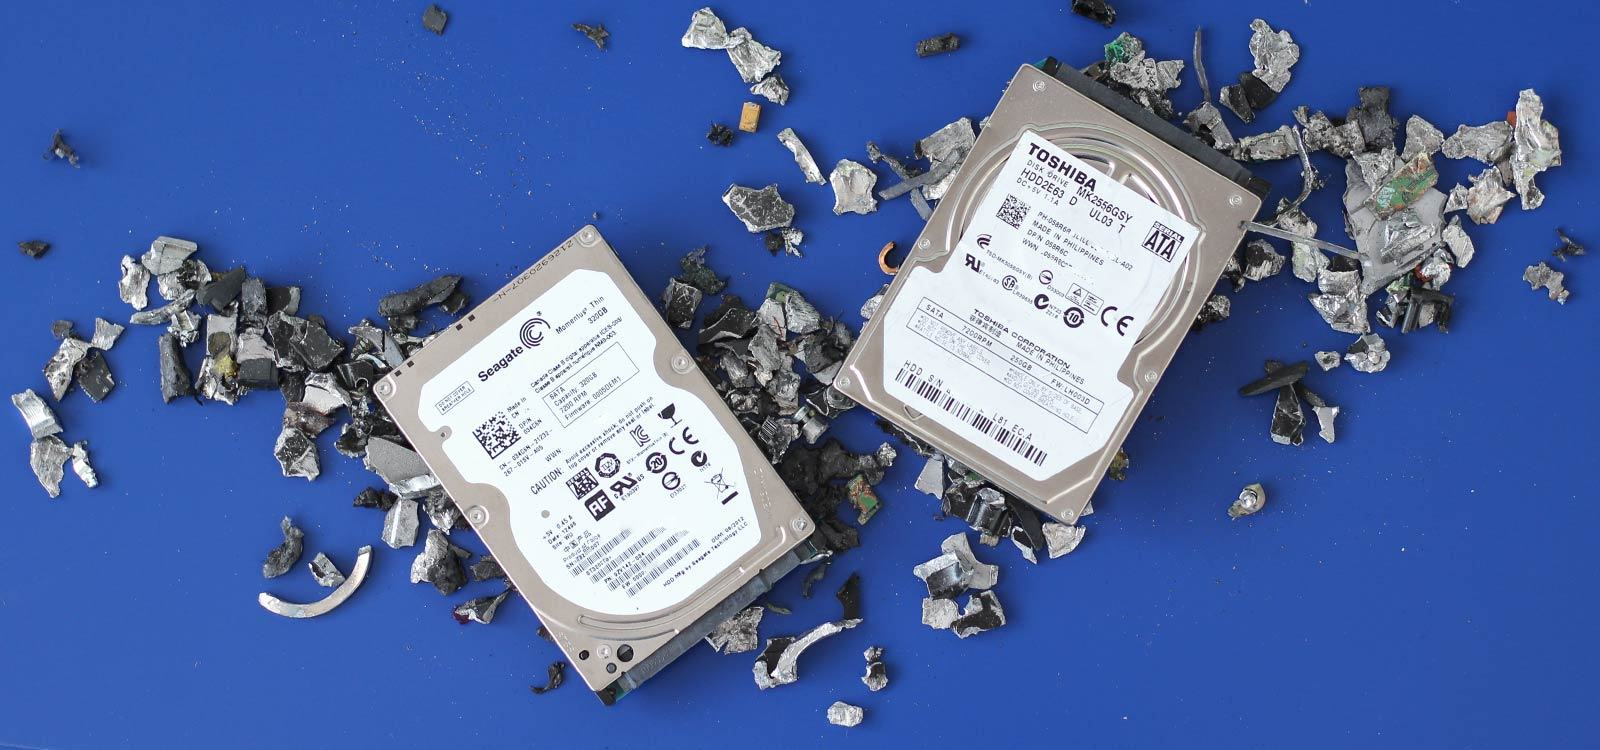 harddisk-vernietigen-beste-vernietigingsmethode-fysieke-vernietiging-header